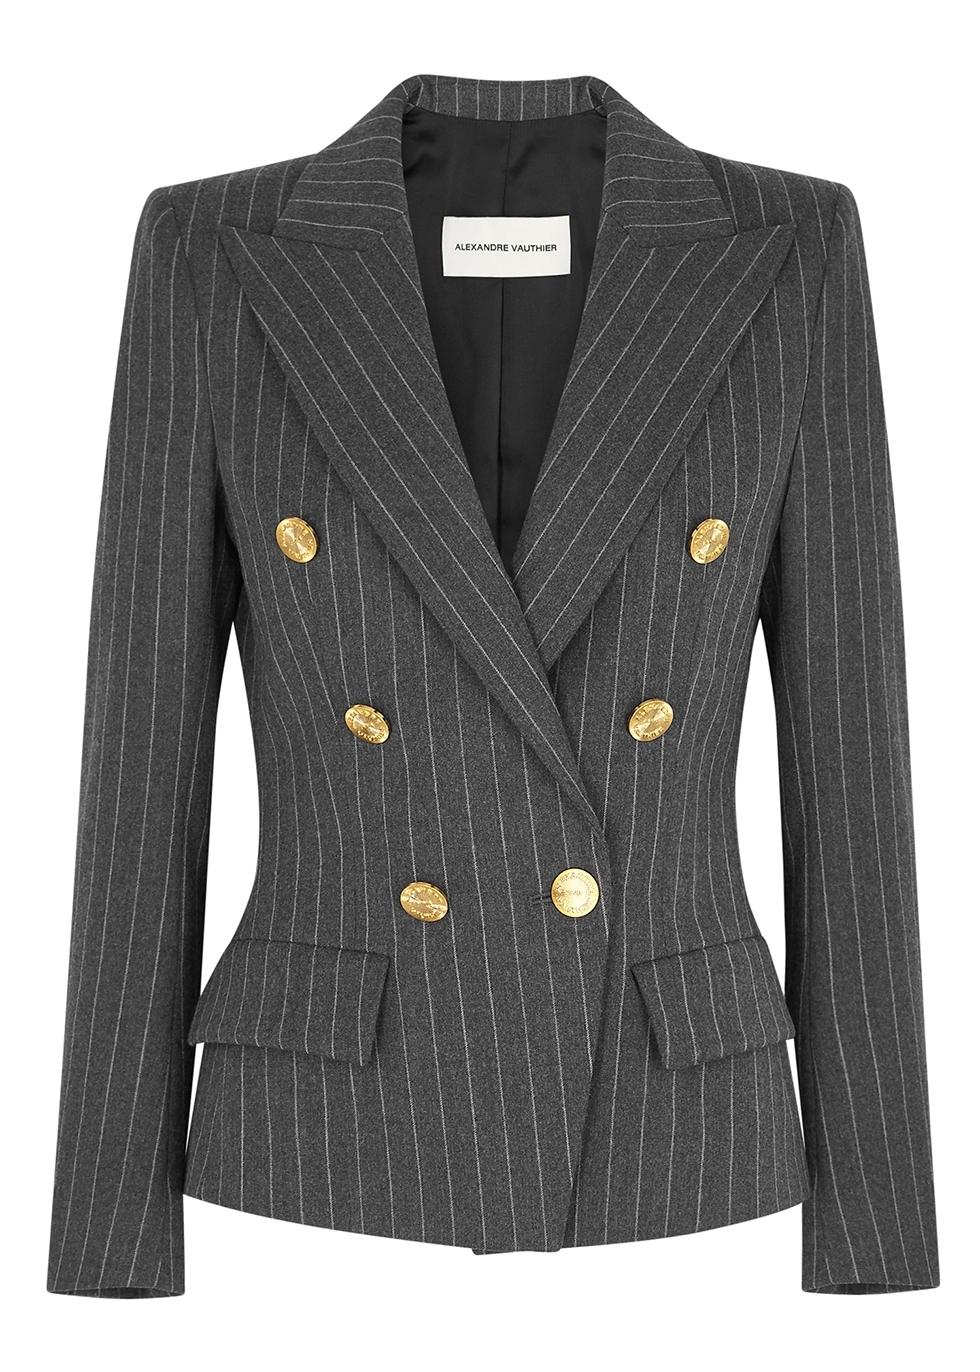 9c7dfb3959 Women's Designer Jackets - Harvey Nichols